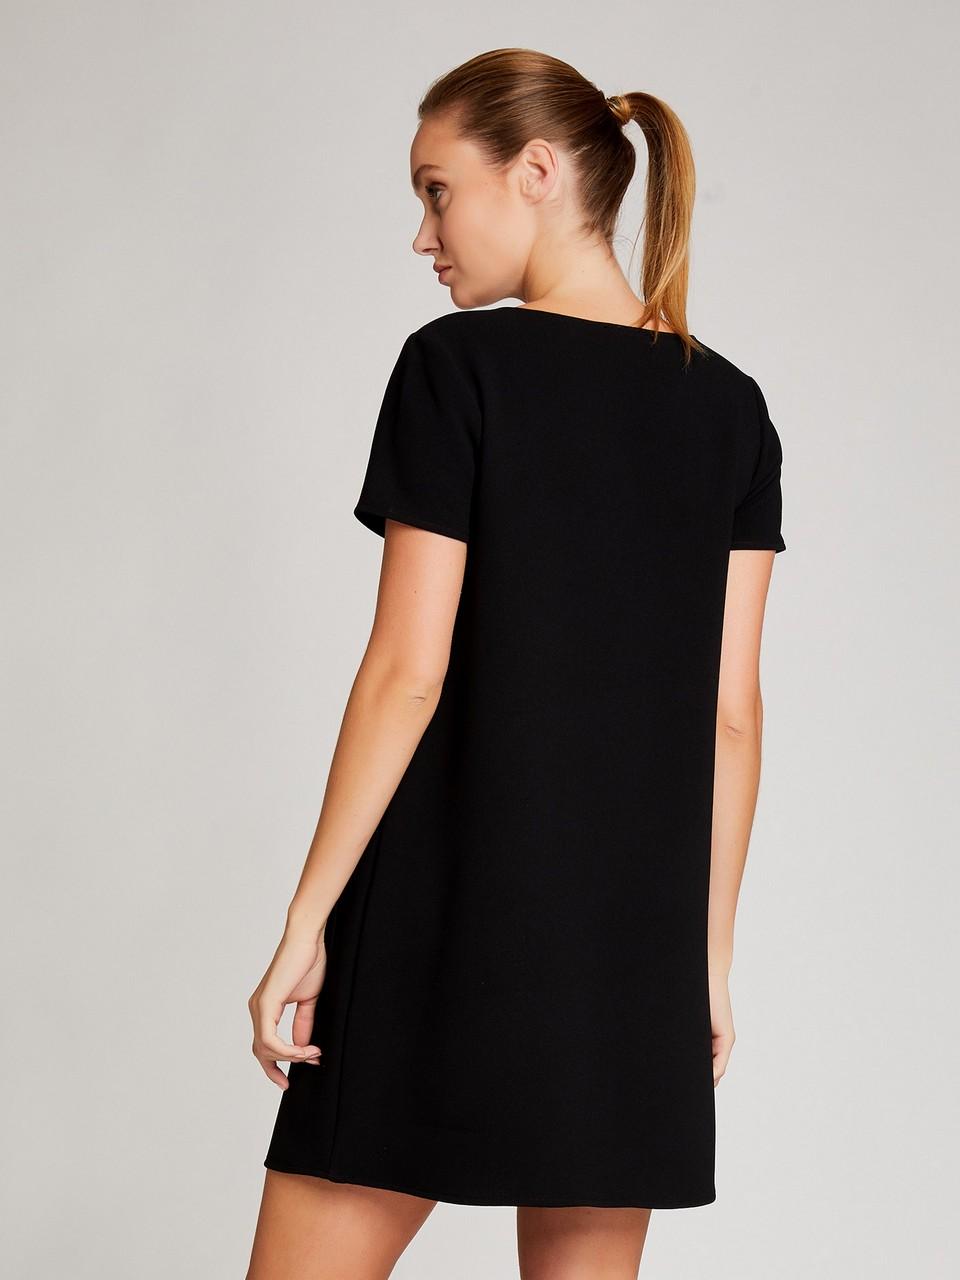 Kısa Kol Mini Elbise